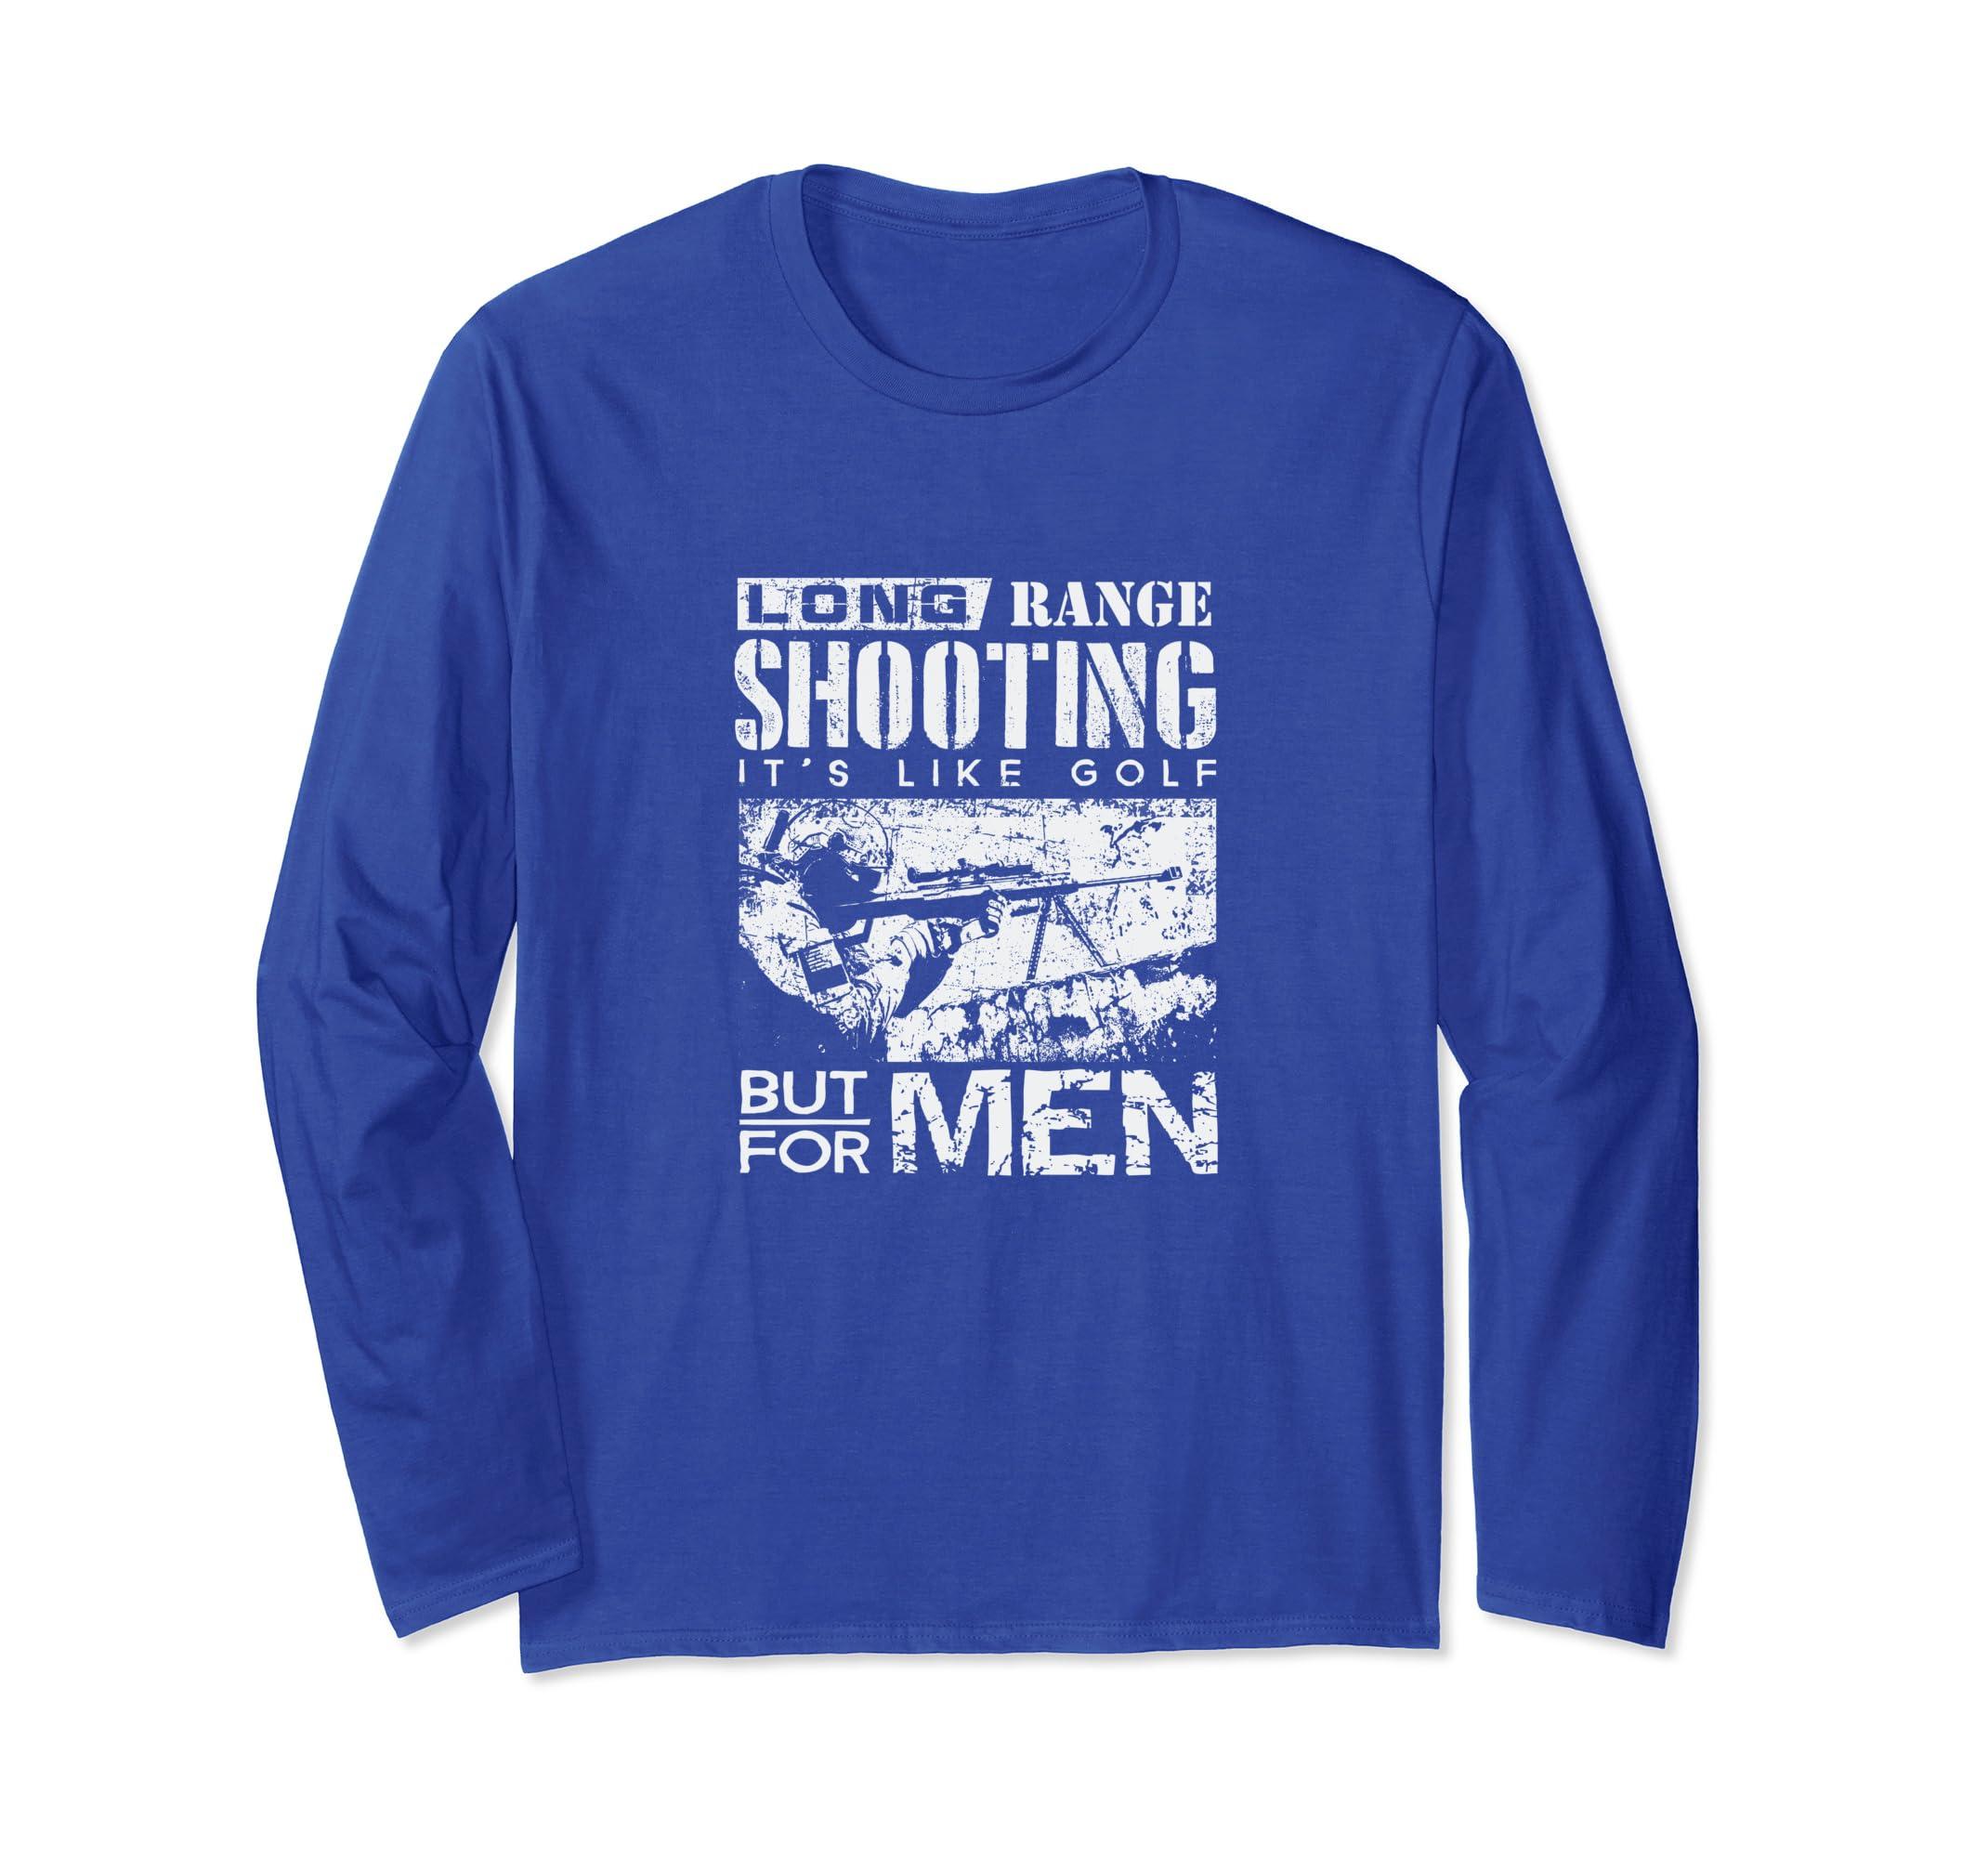 292d62ea1 Amazon.com: Long range Shooting Like golf Funny Veteran Shooter T Shirt:  Clothing